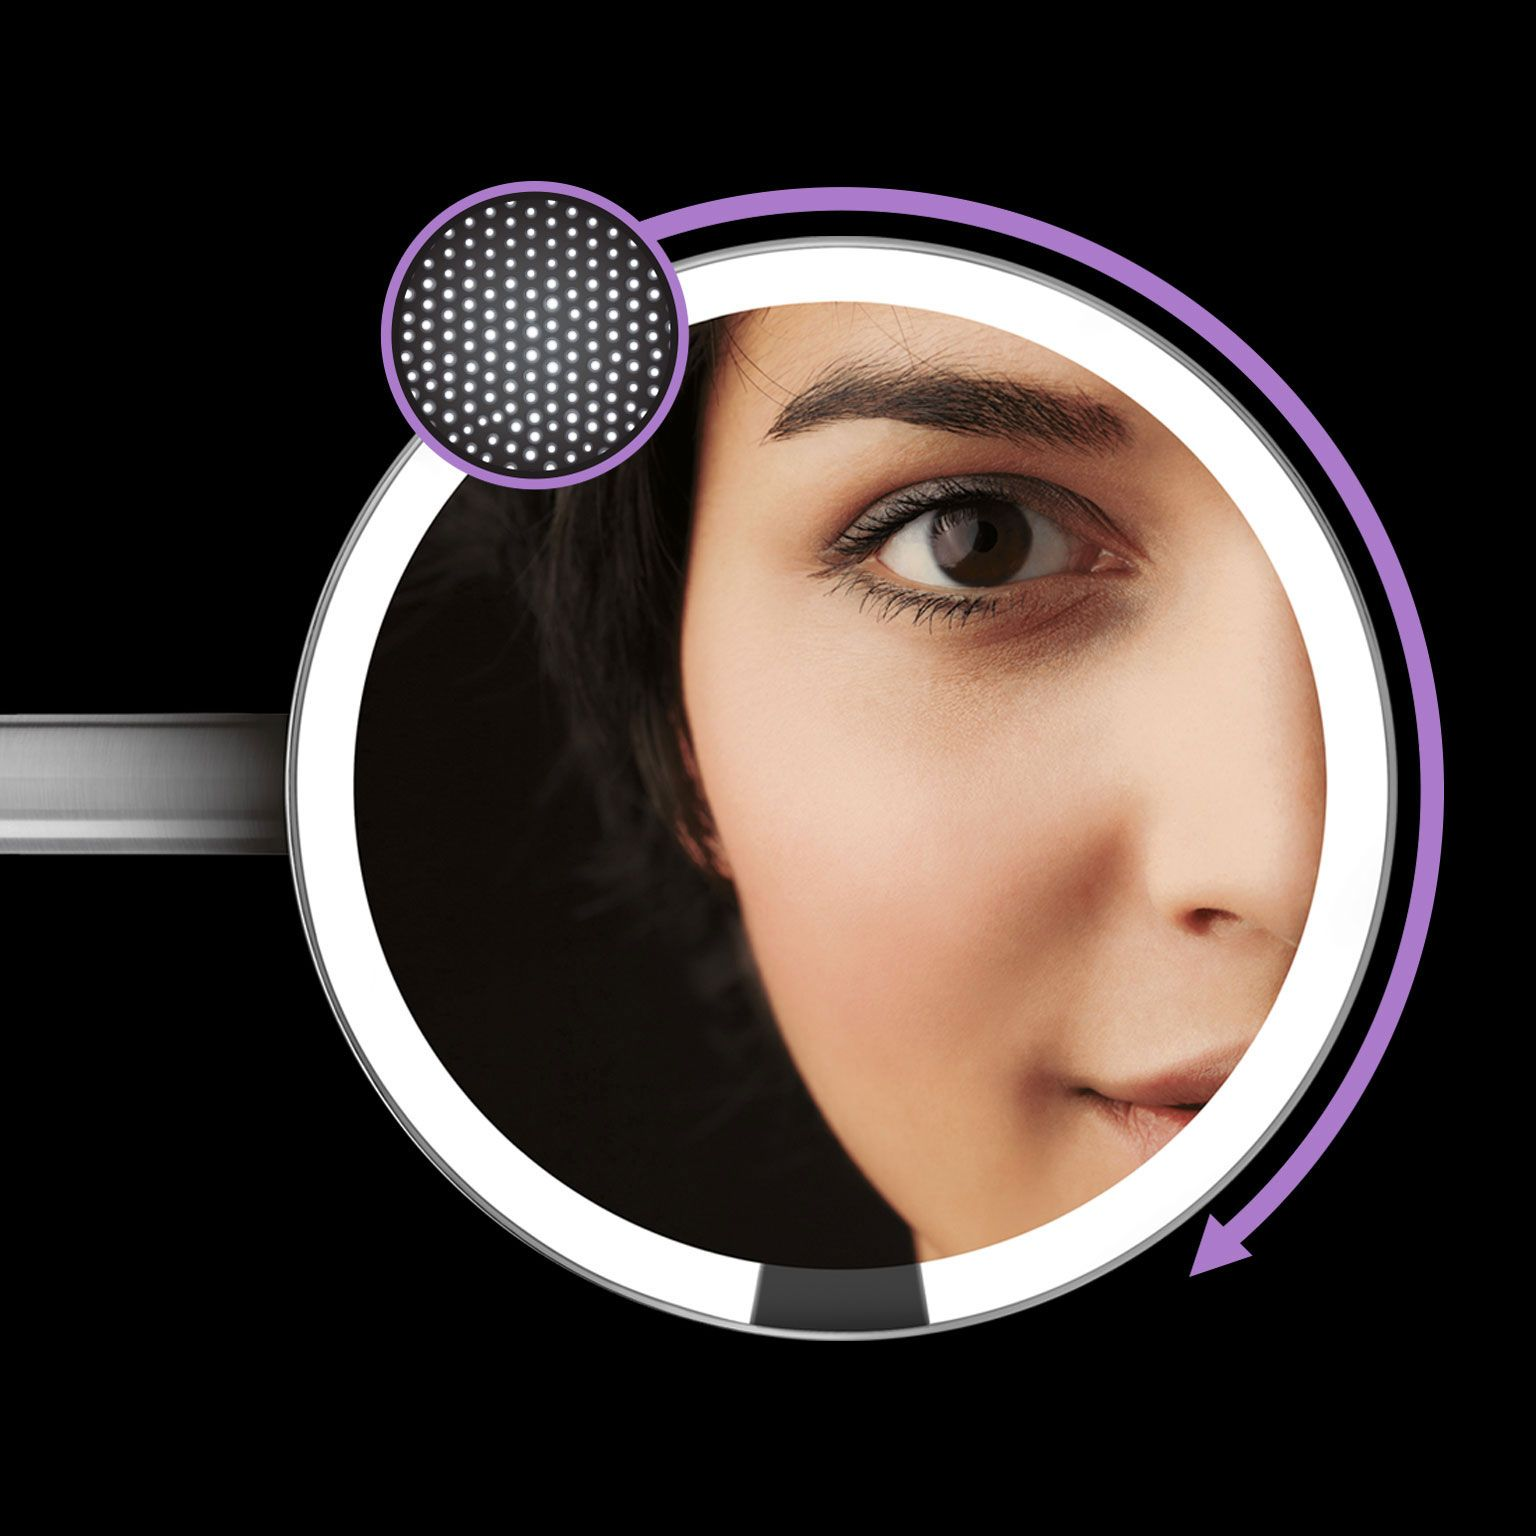 Sensor mirror 8'' wall mount 5x magnification Makeup